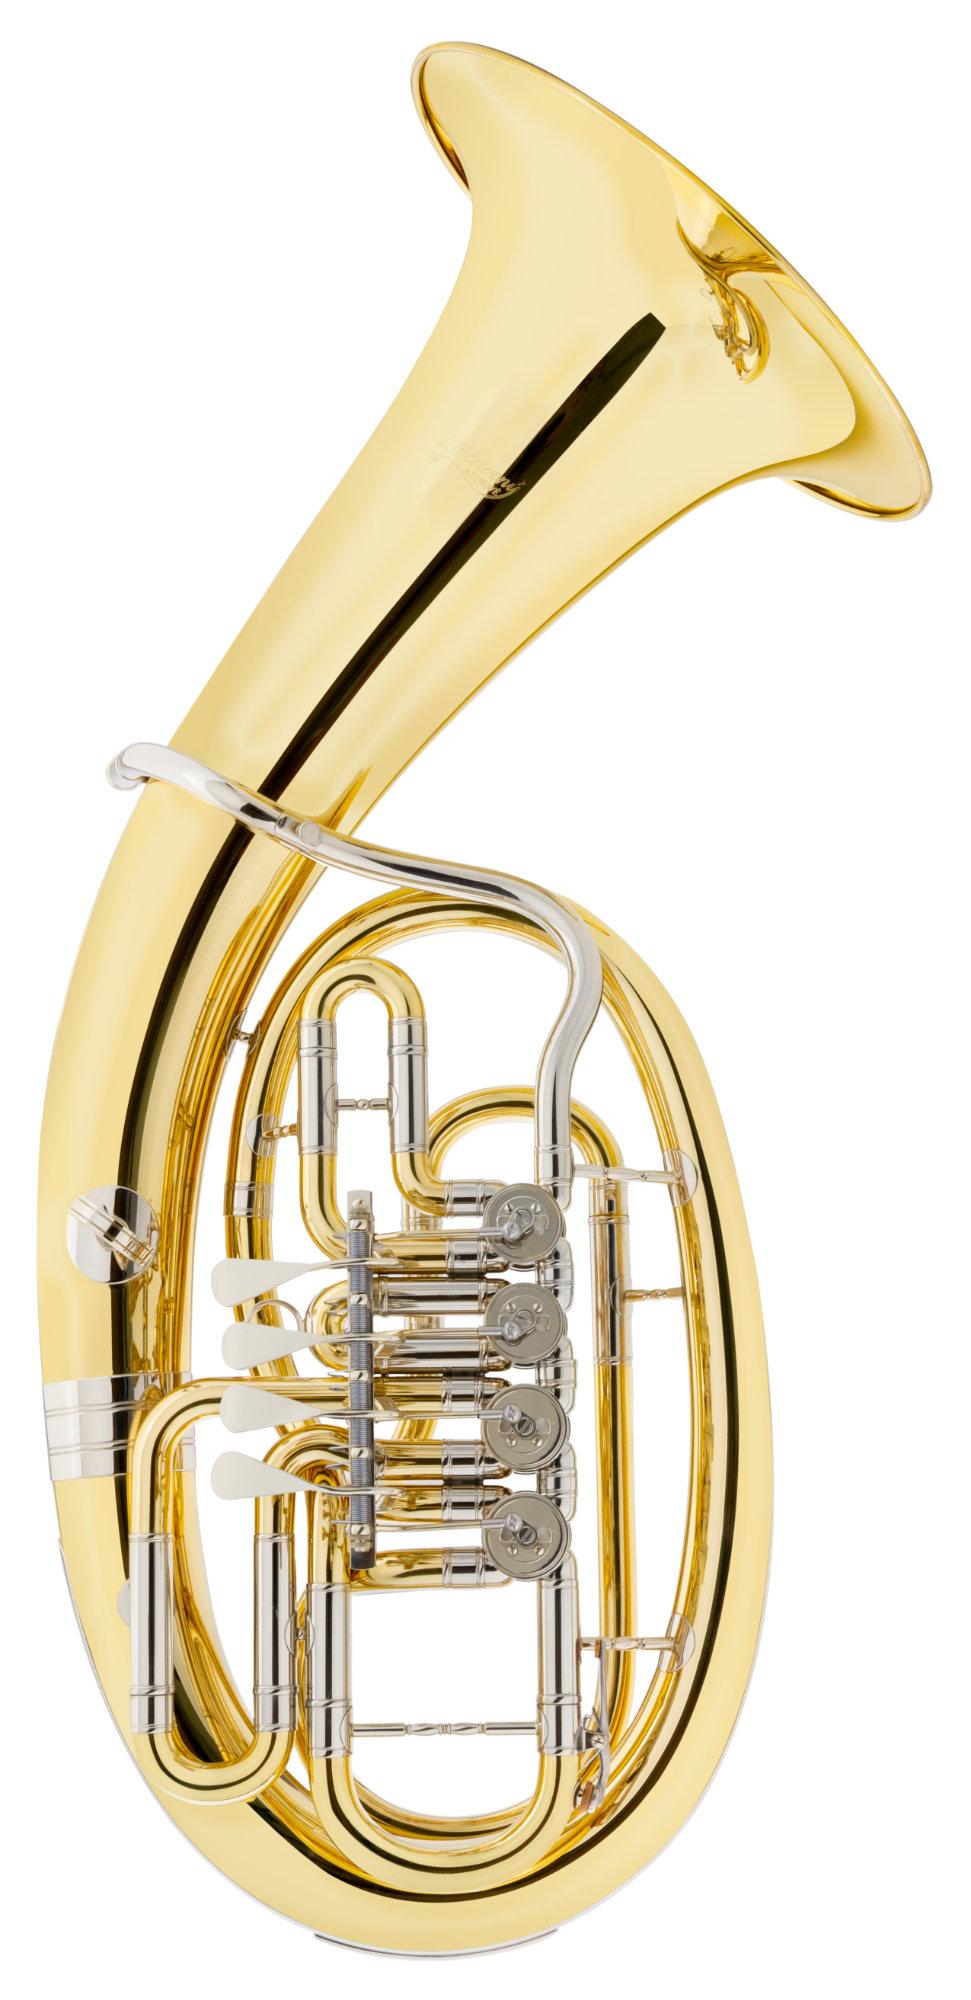 Baritone - Cerveny CVEP 537 4 Bariton - Onlineshop Musikhaus Kirstein